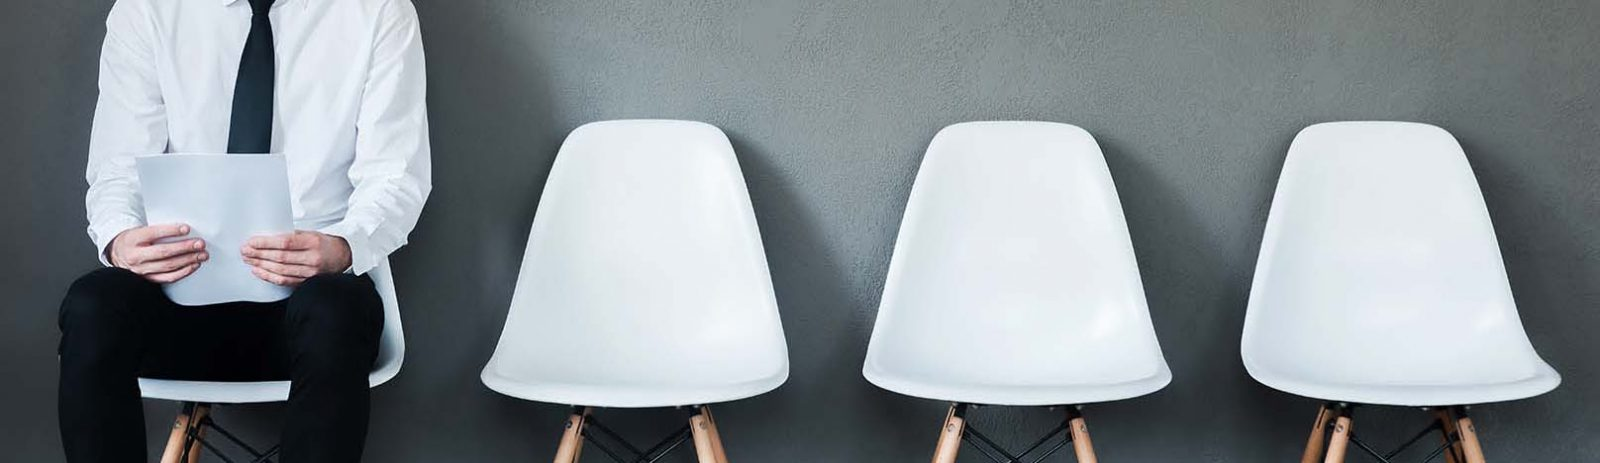 job-interview-waiting